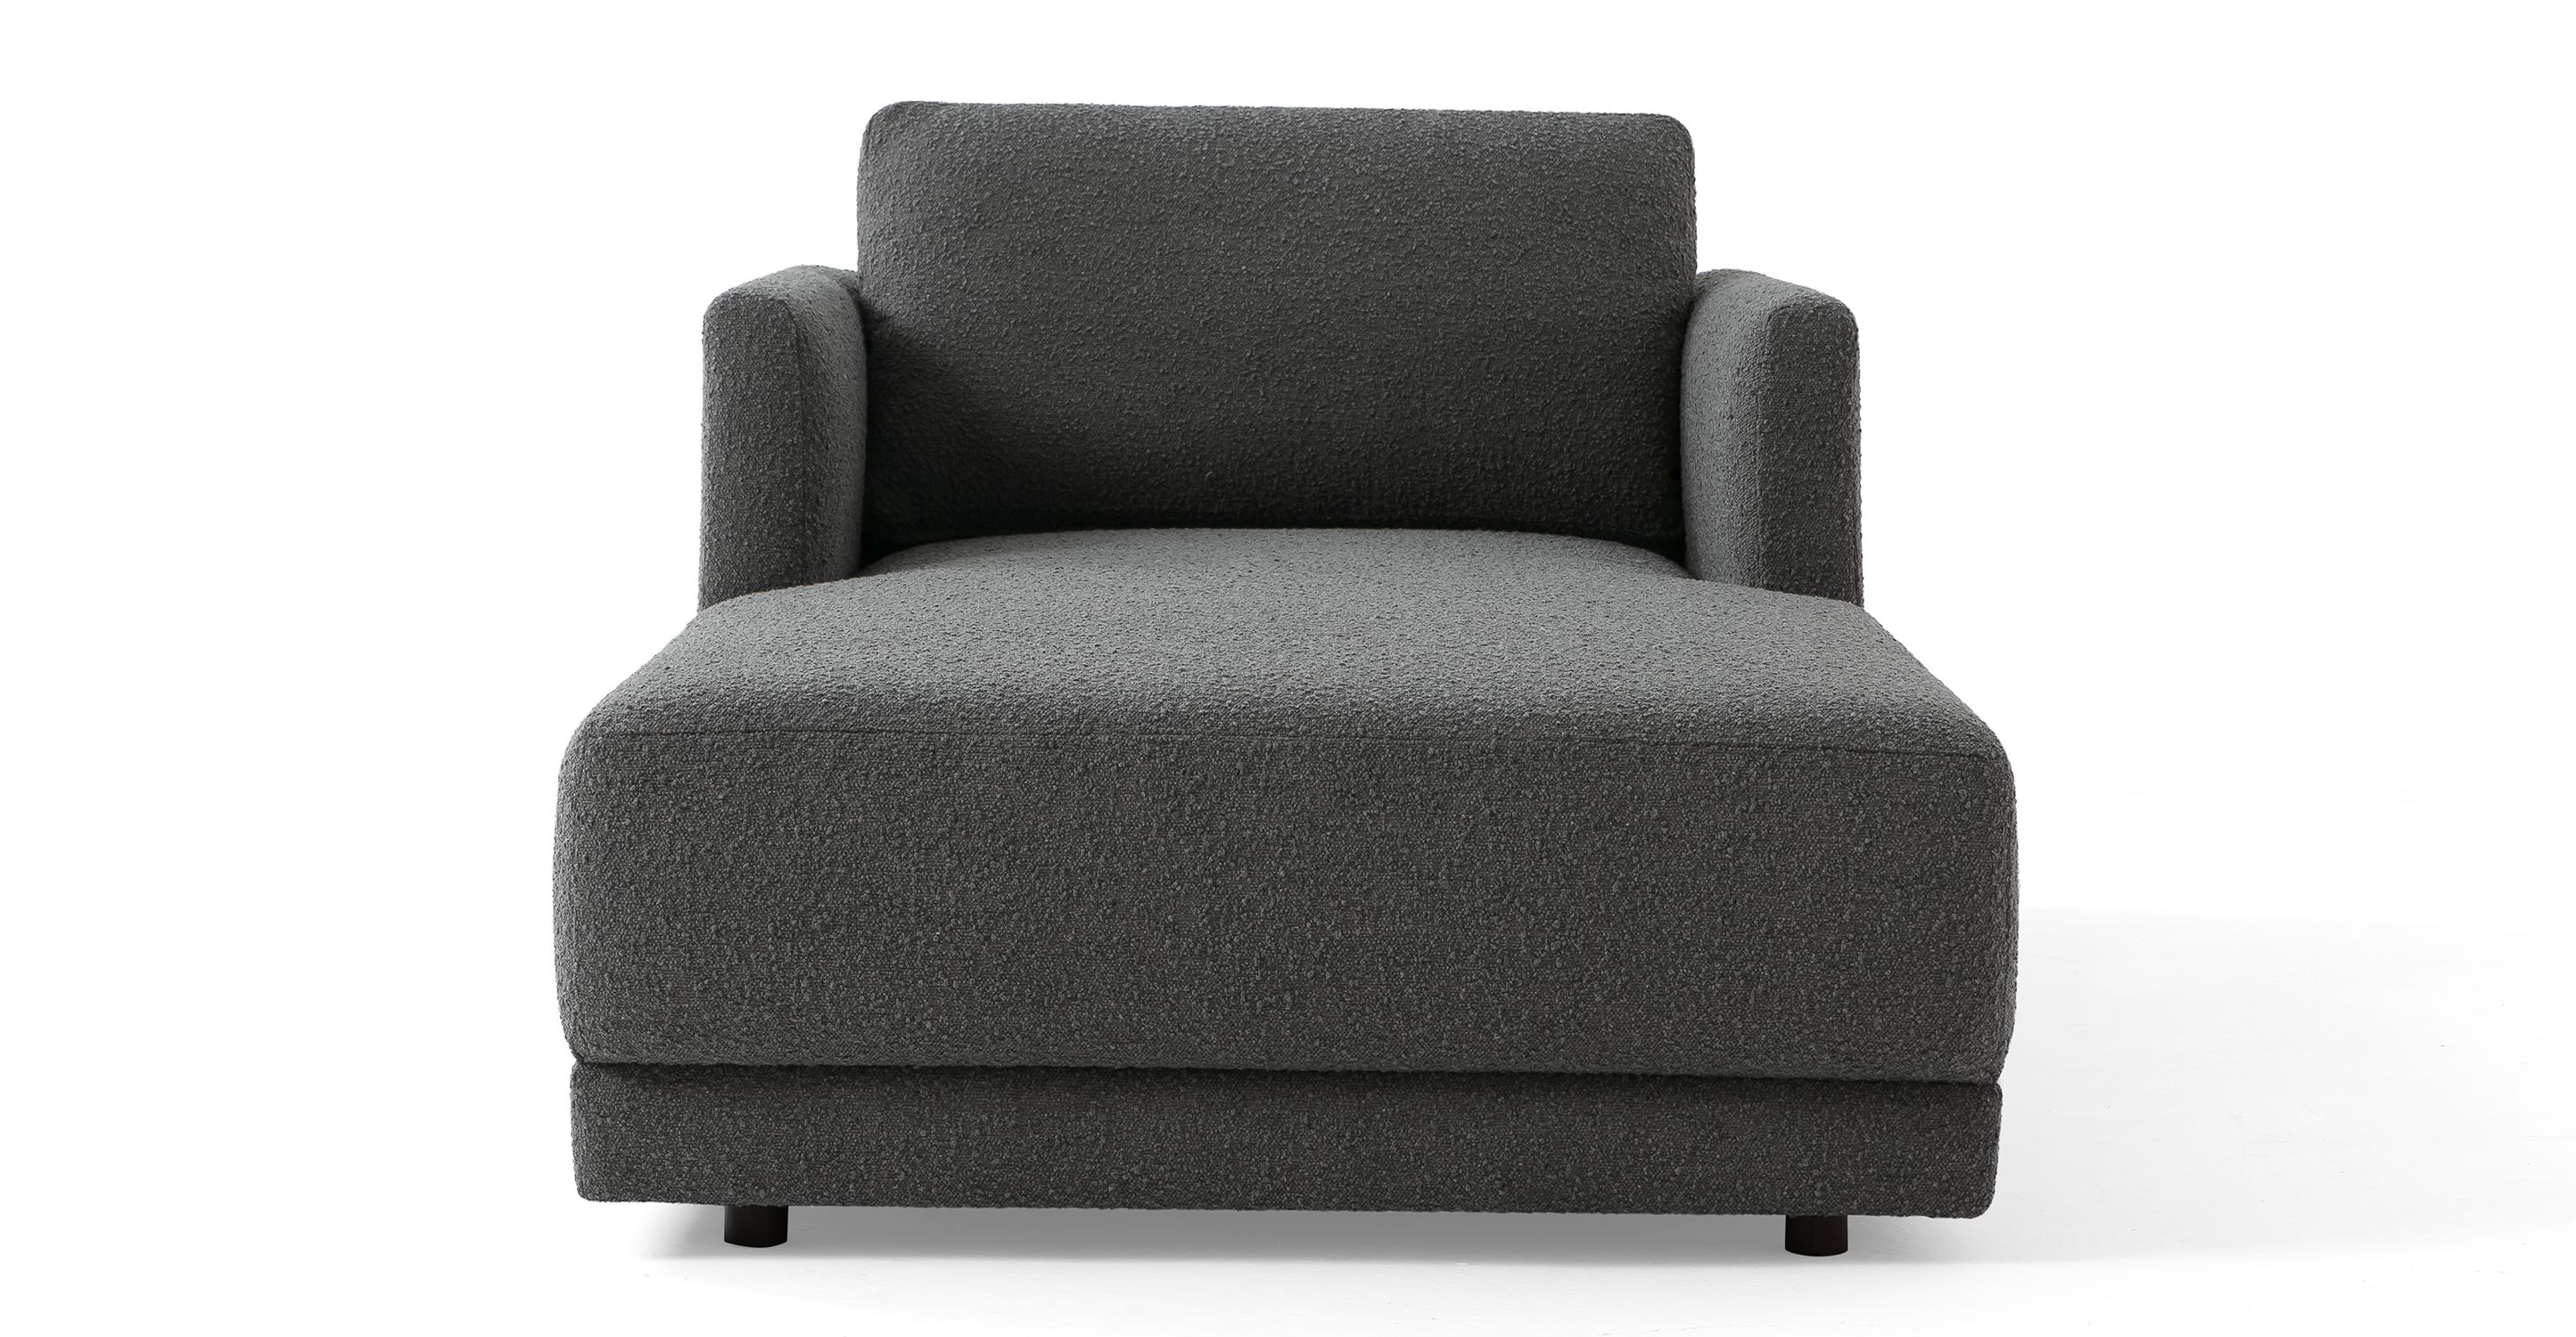 "Domus 39"" Fabric Chaise Lounge, Gris Boucle"